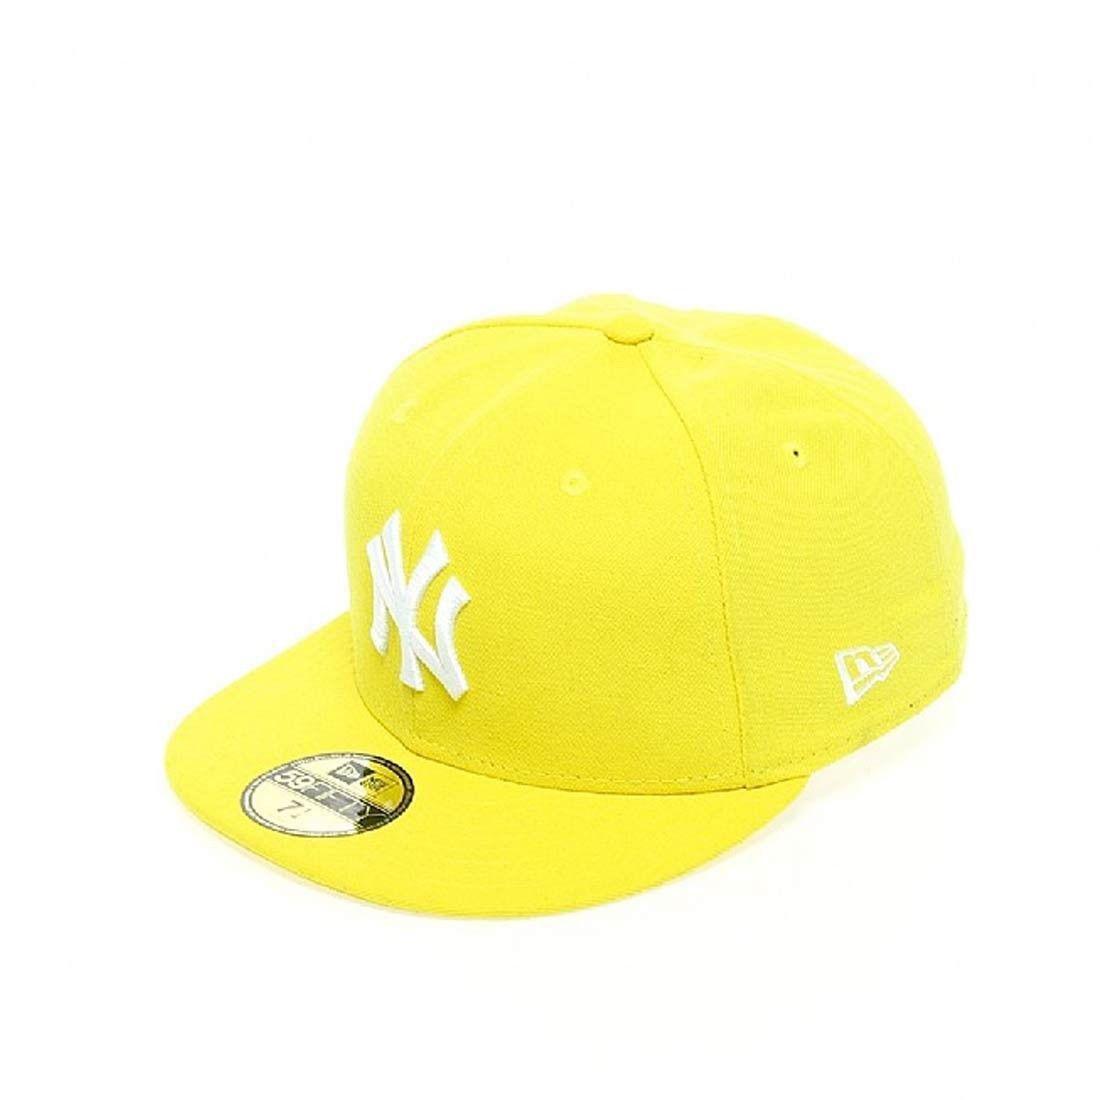 Gorra Cap New Era MLB Basic NY Yankees 59FIFTY  beaeece90d9